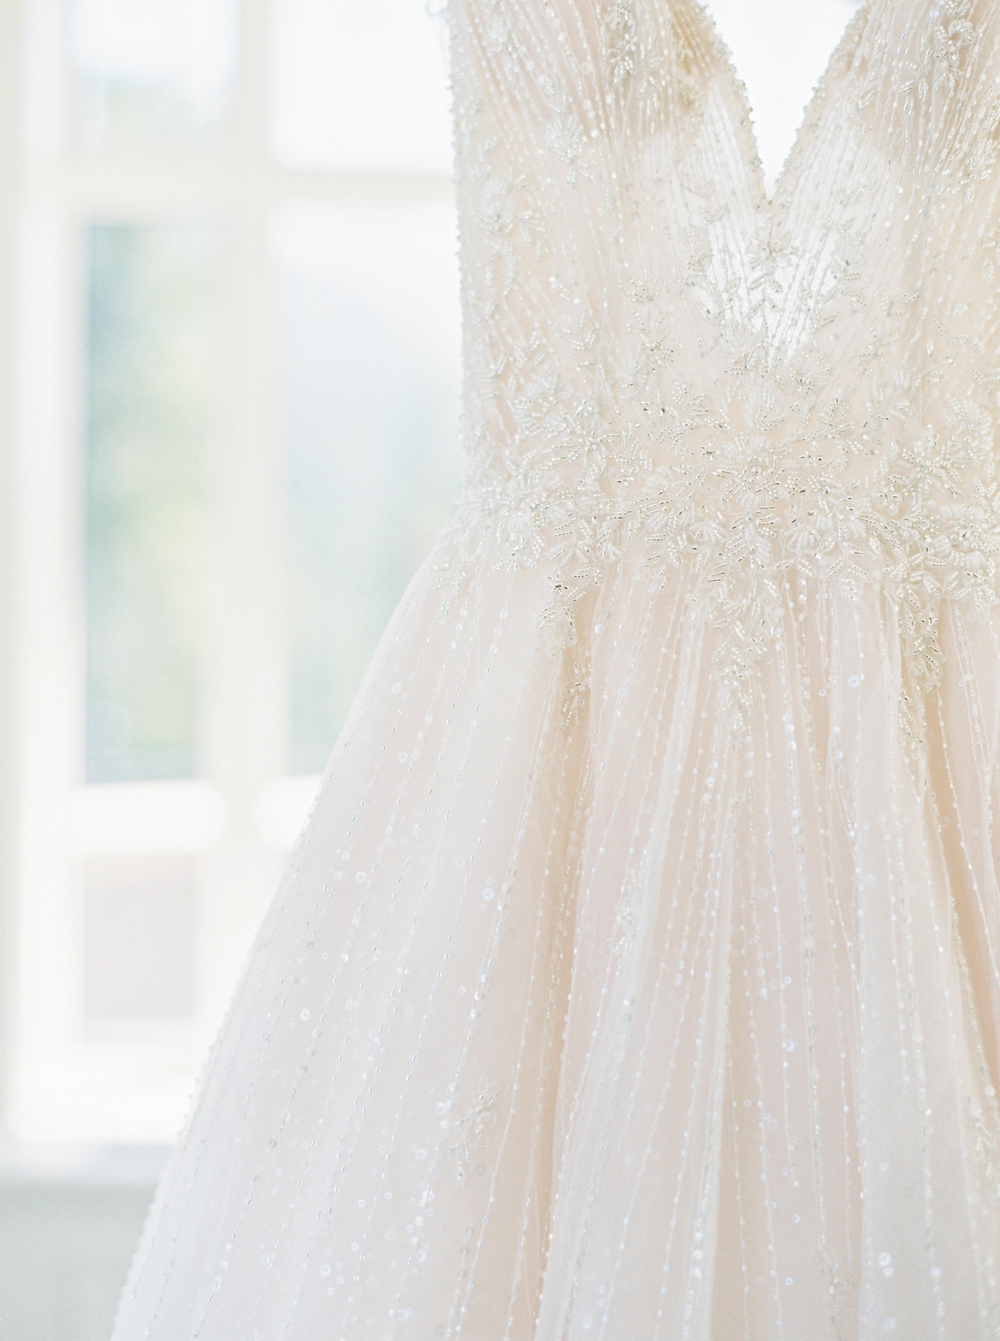 Bride Getting ready wedding details wedding dress with plunging neckline | Banff Wedding Photographers | Justine Milton fine art film photography